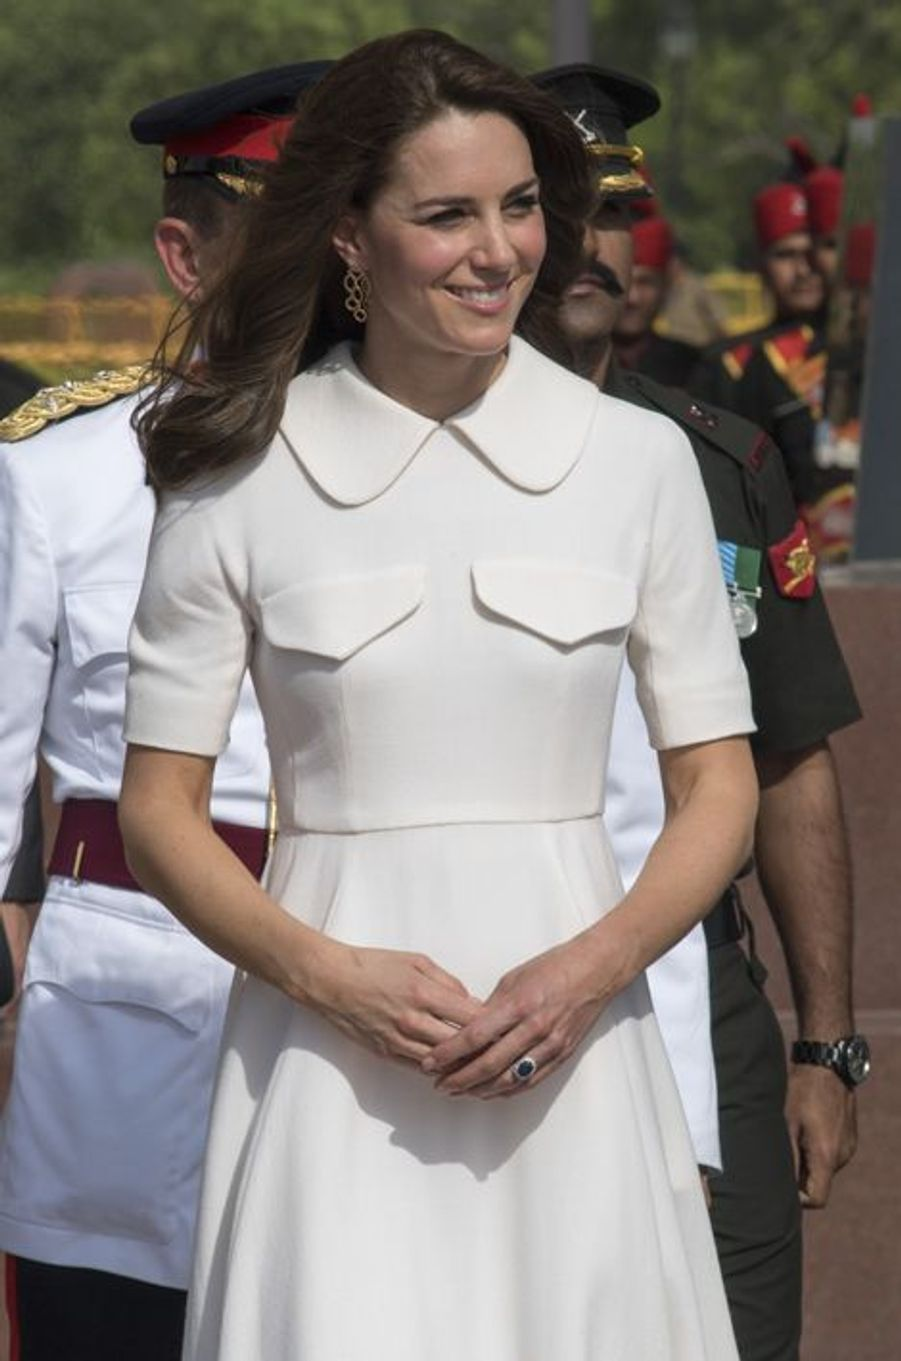 La duchesse Catherine de Cambridge en Emilia Wickstead, le 11 avril 2016